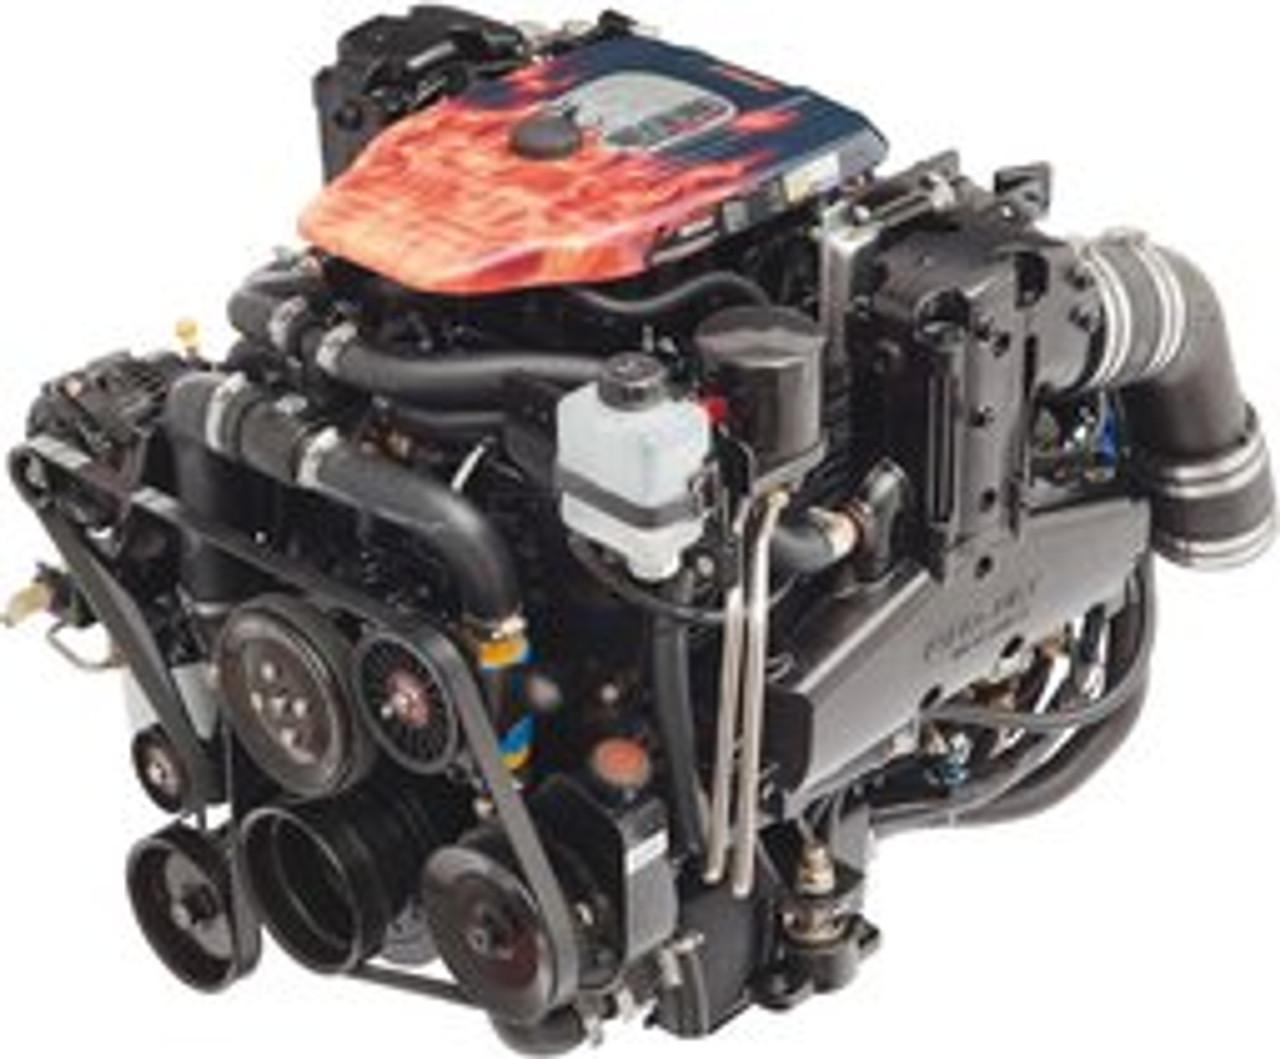 medium resolution of mercruiser plus series 383 mag stroker mpi bravo engine 350 hp 714 865108r80